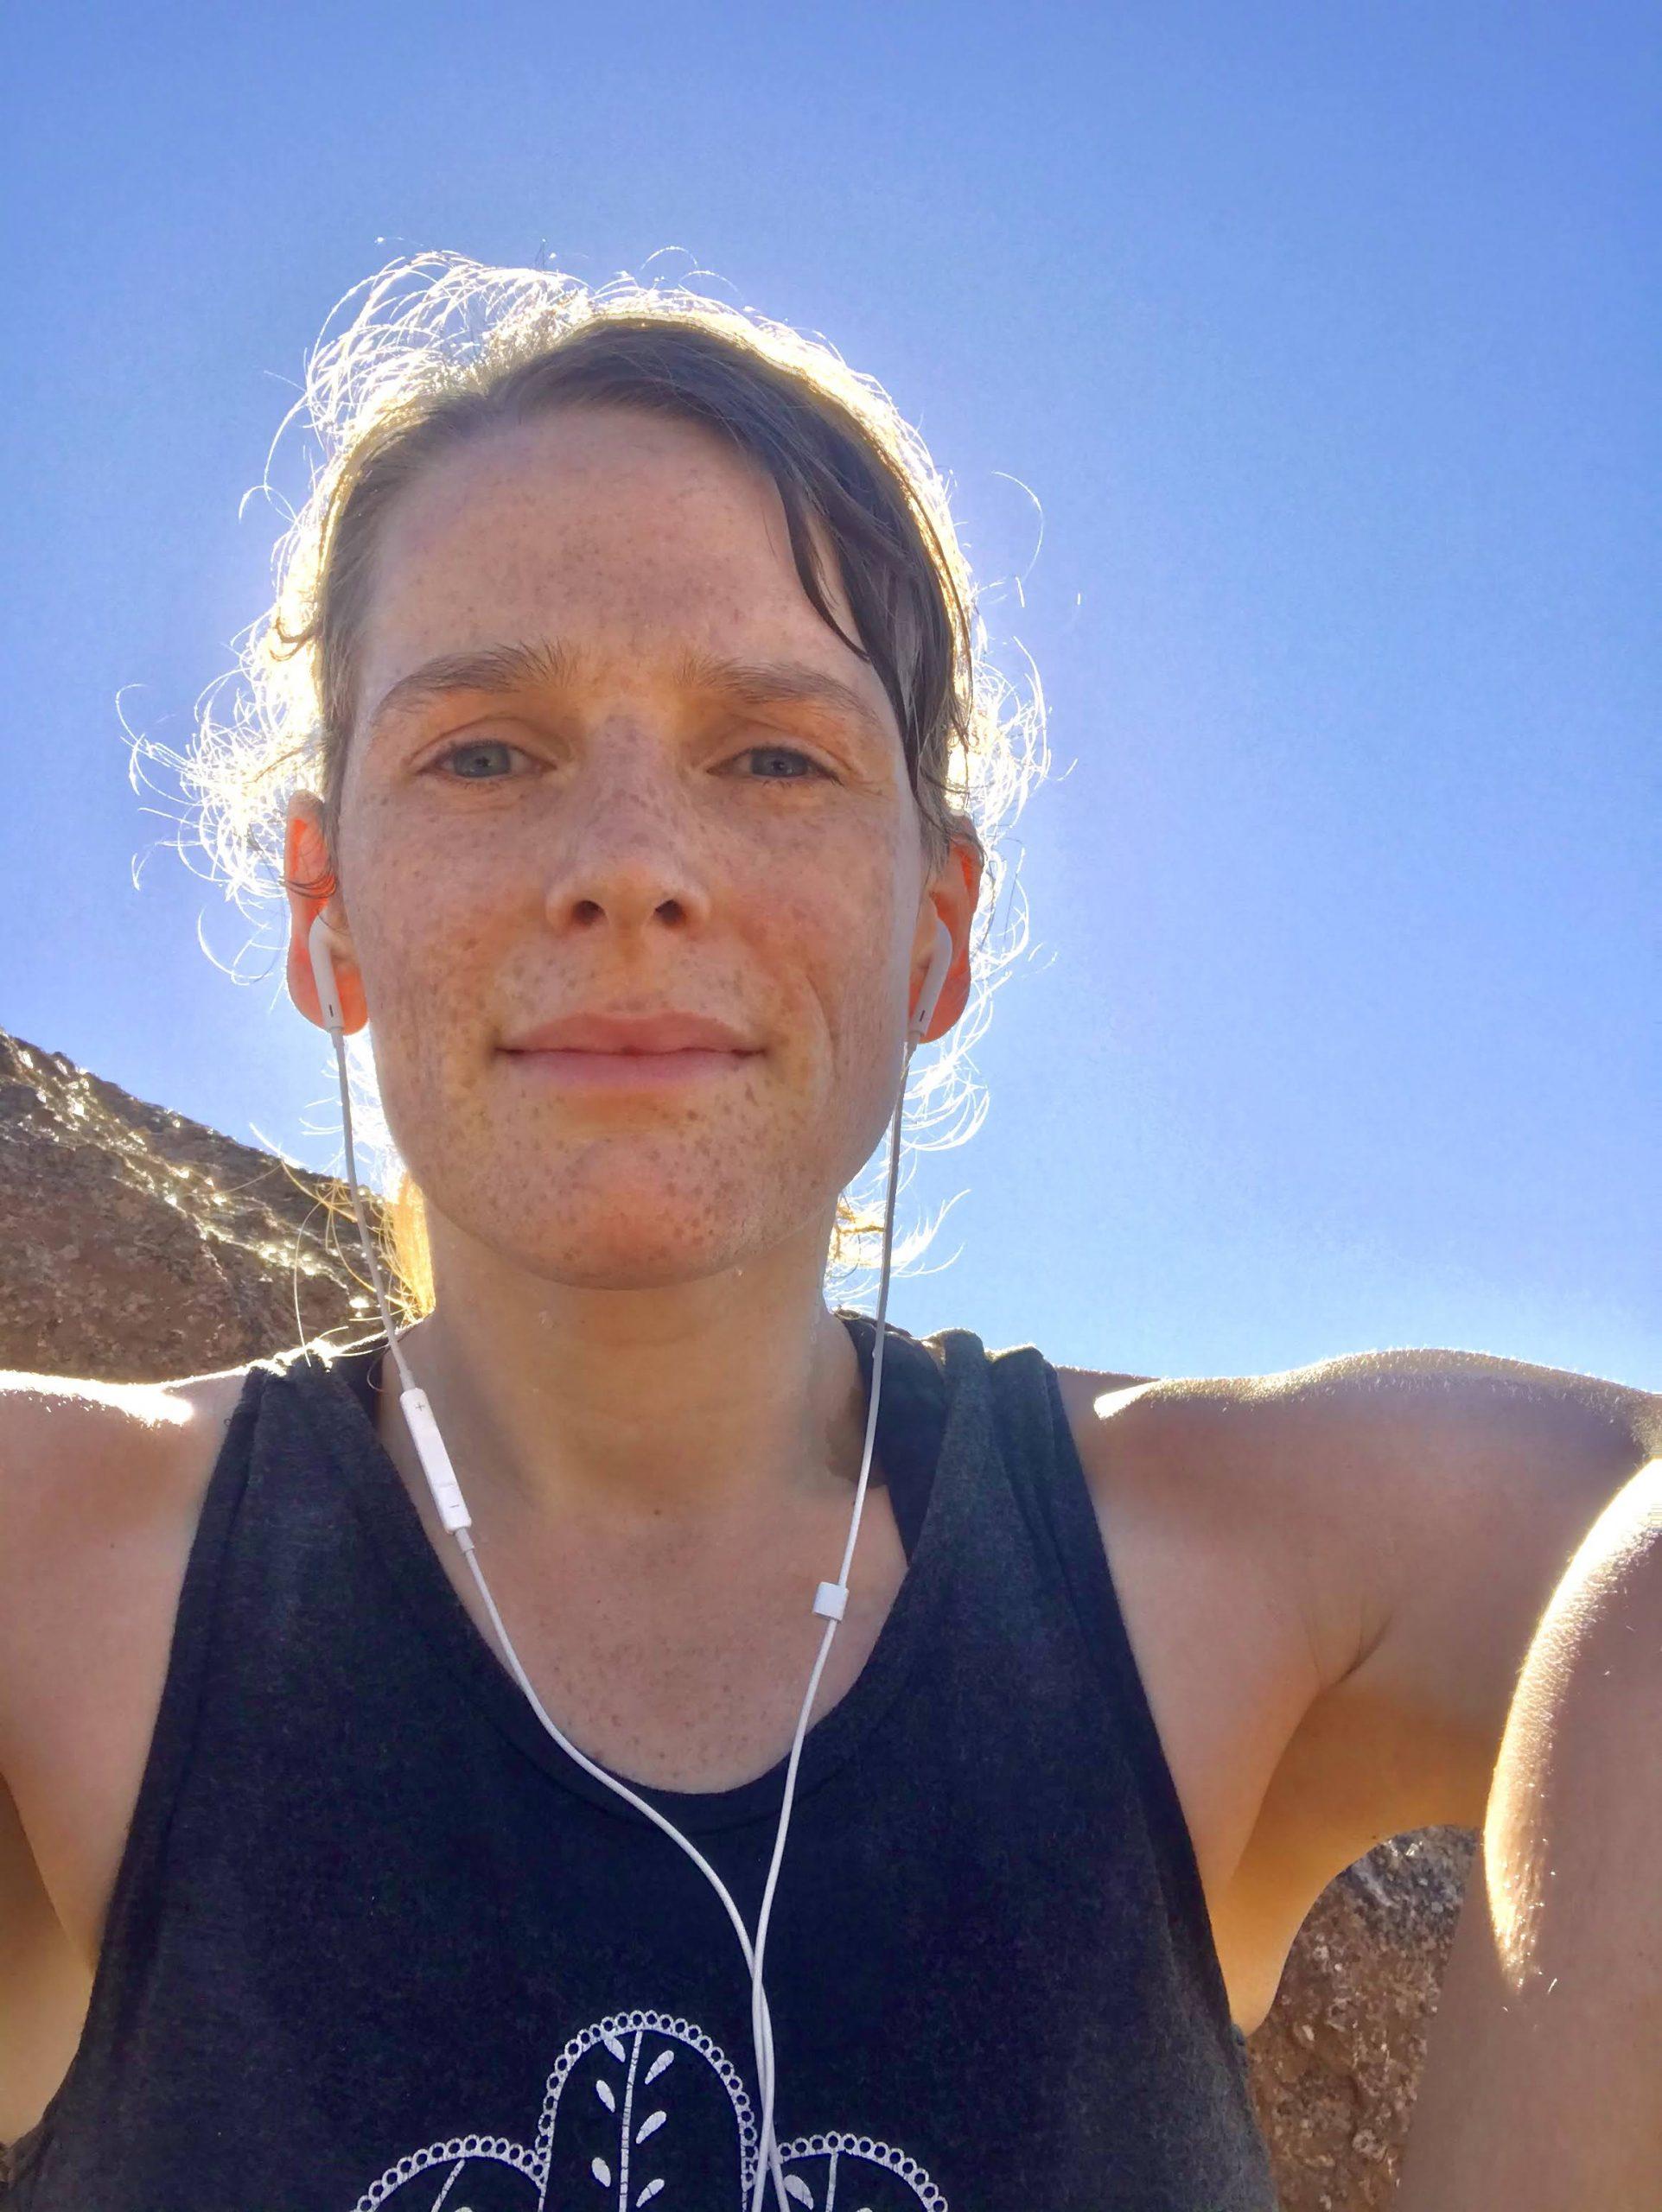 Piestewa vs Camelback? Which should you hike? Accomplishment